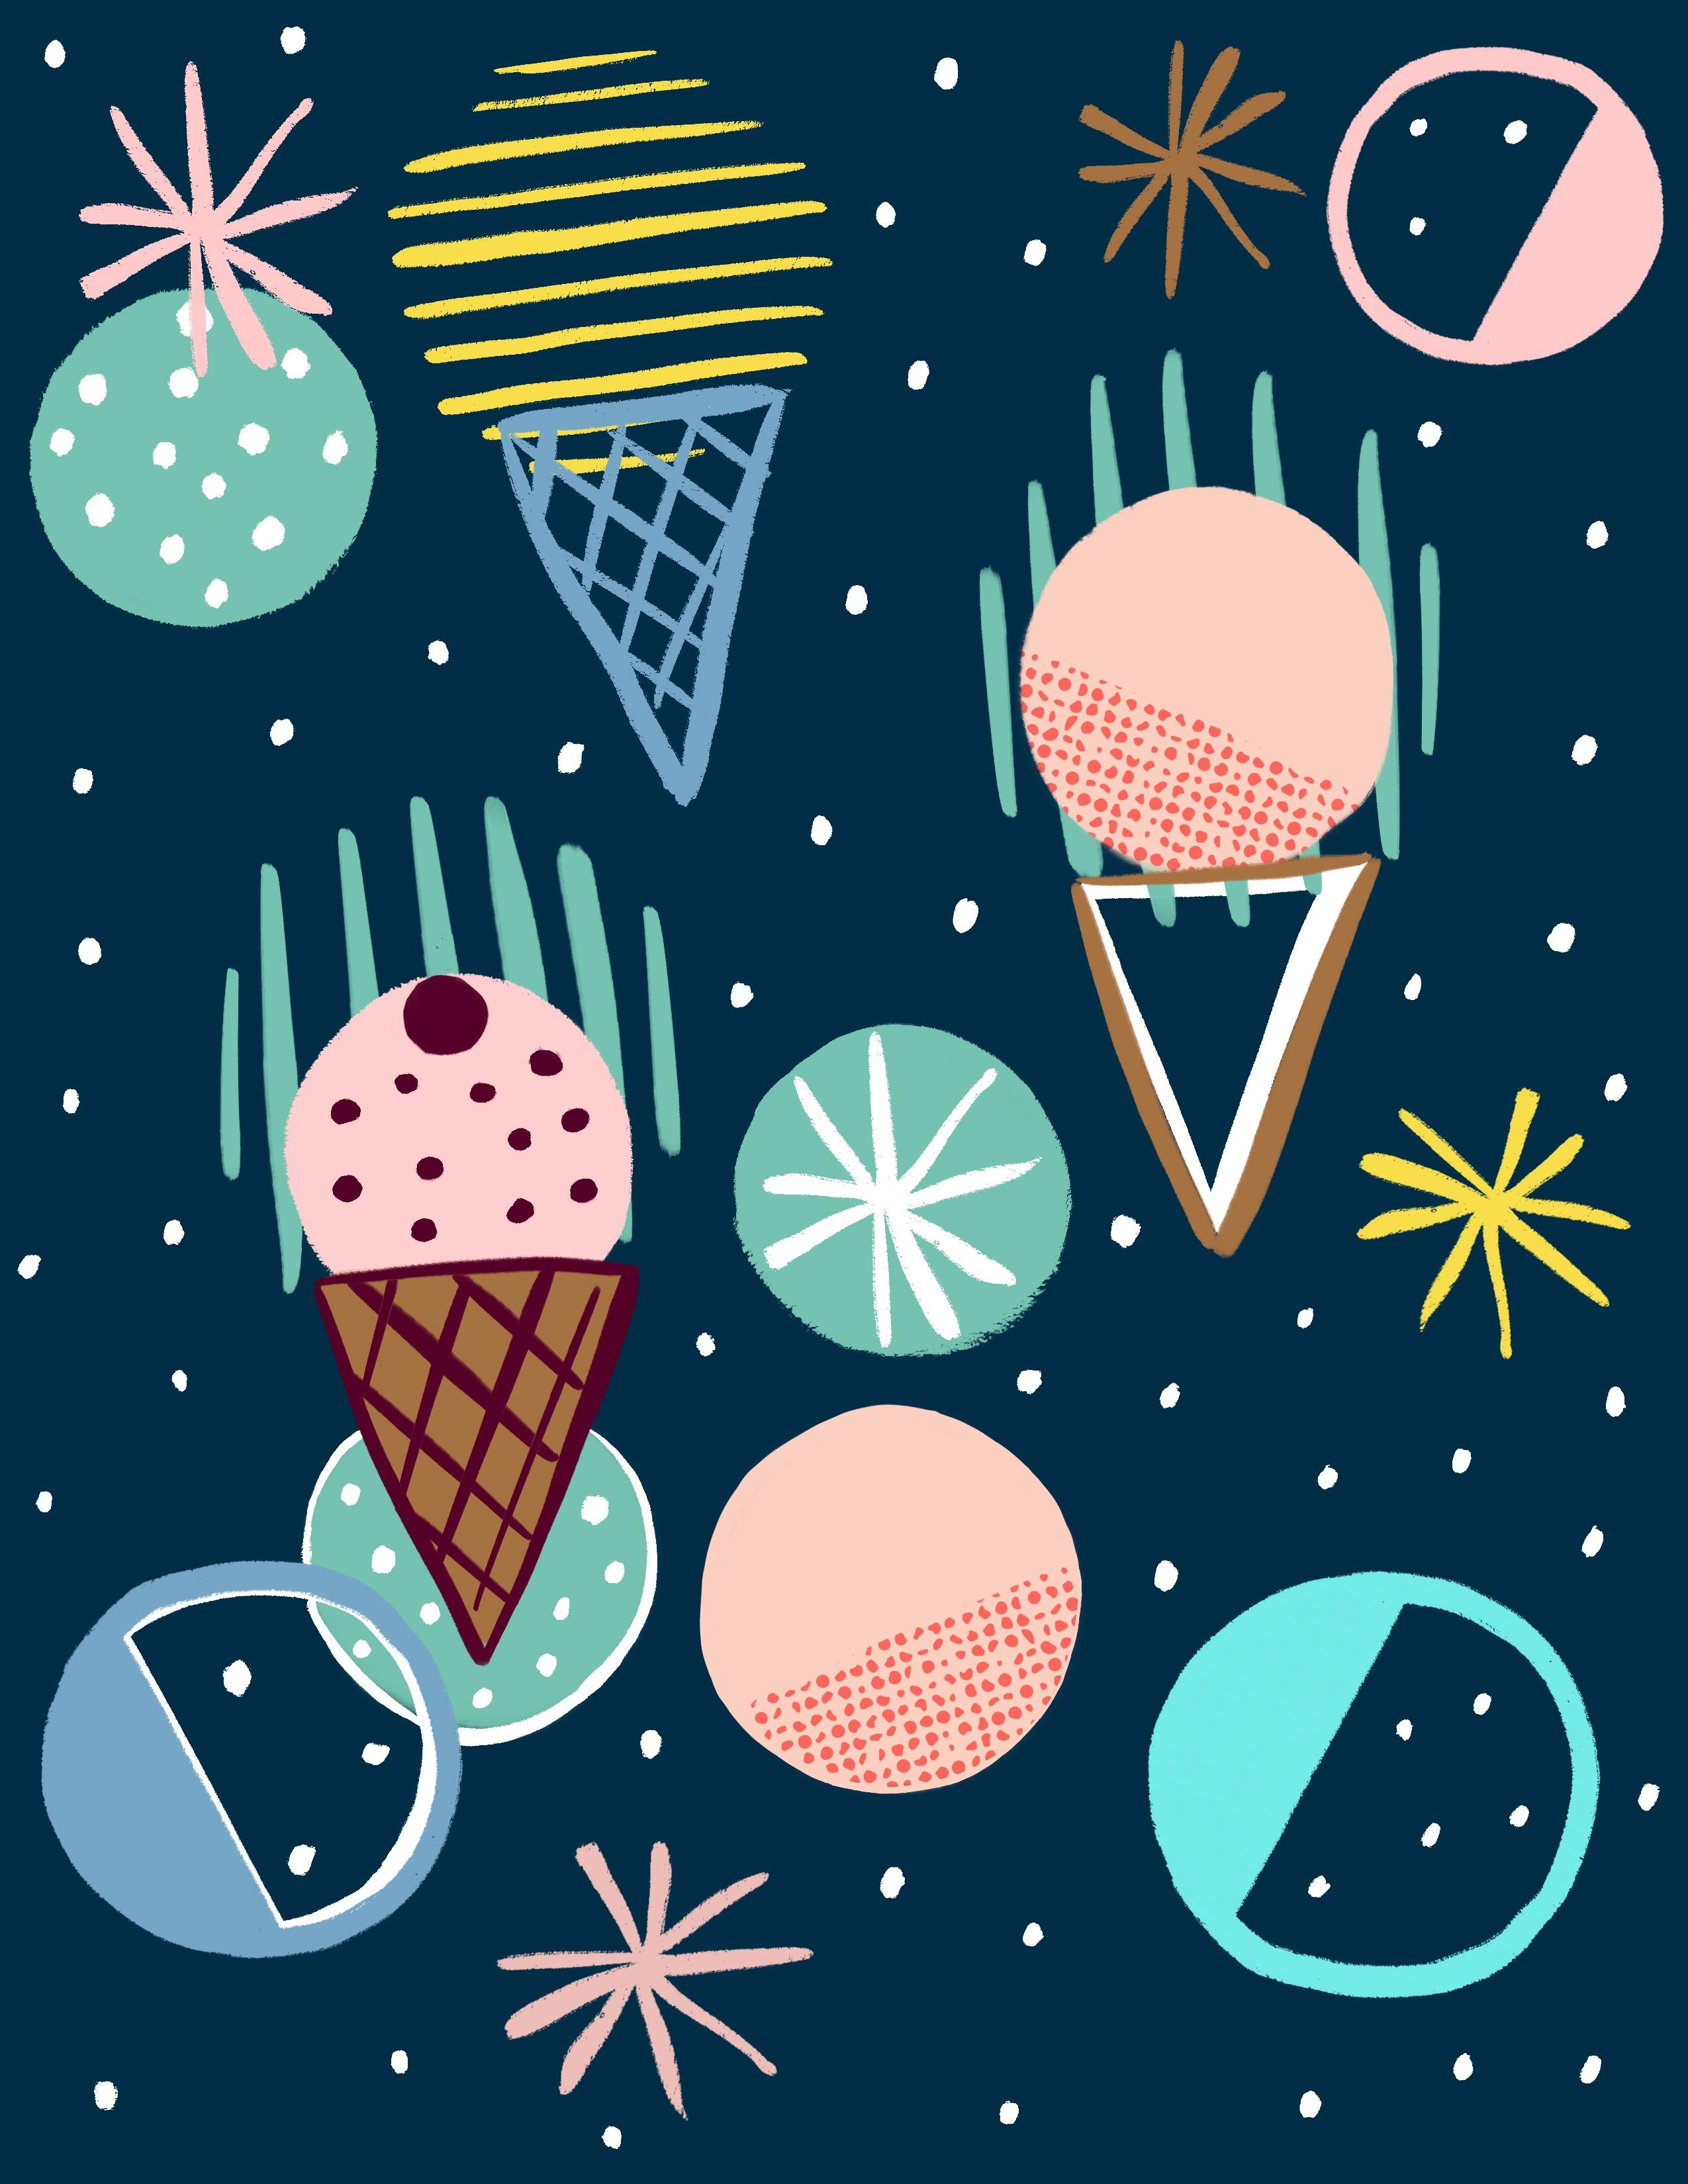 Ice cream universe